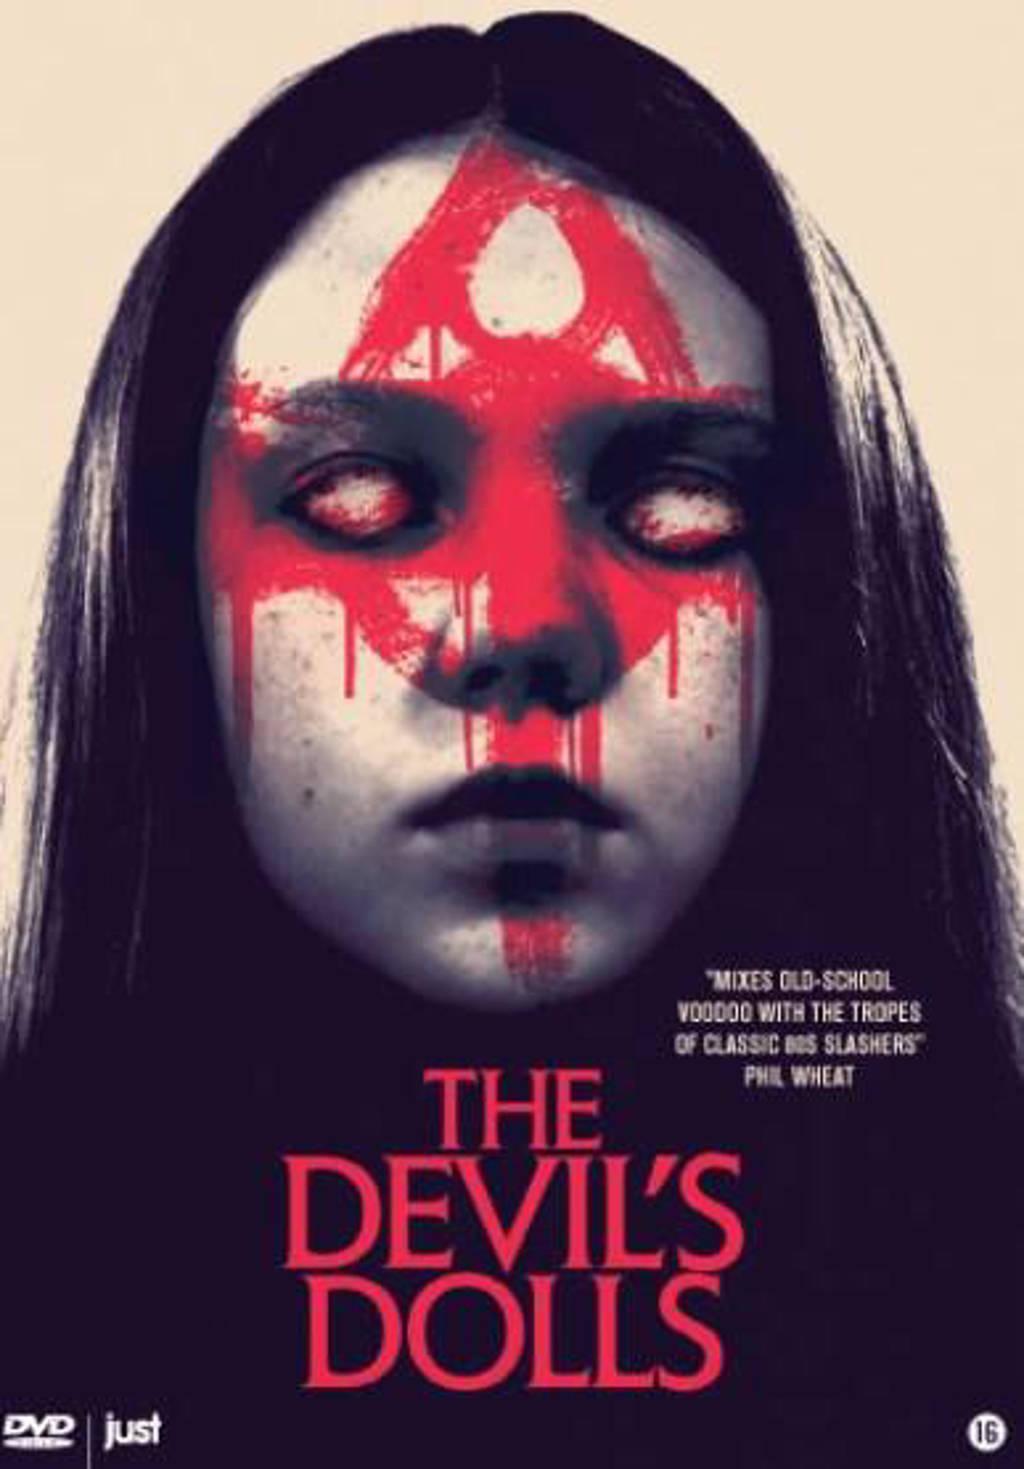 Devil's dolls  (DVD)